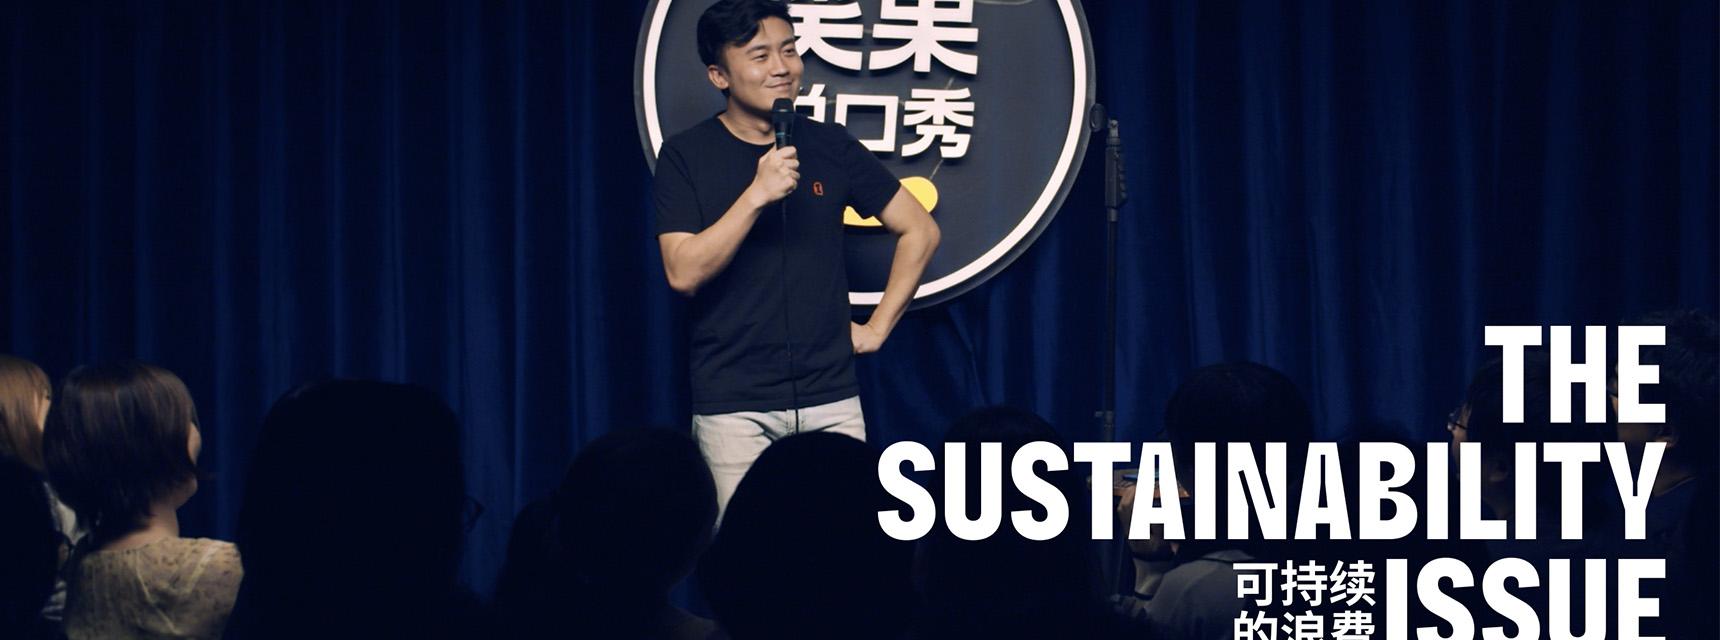 The Unreasonable 推出全新纪录片,聚焦中国可持续发展进程